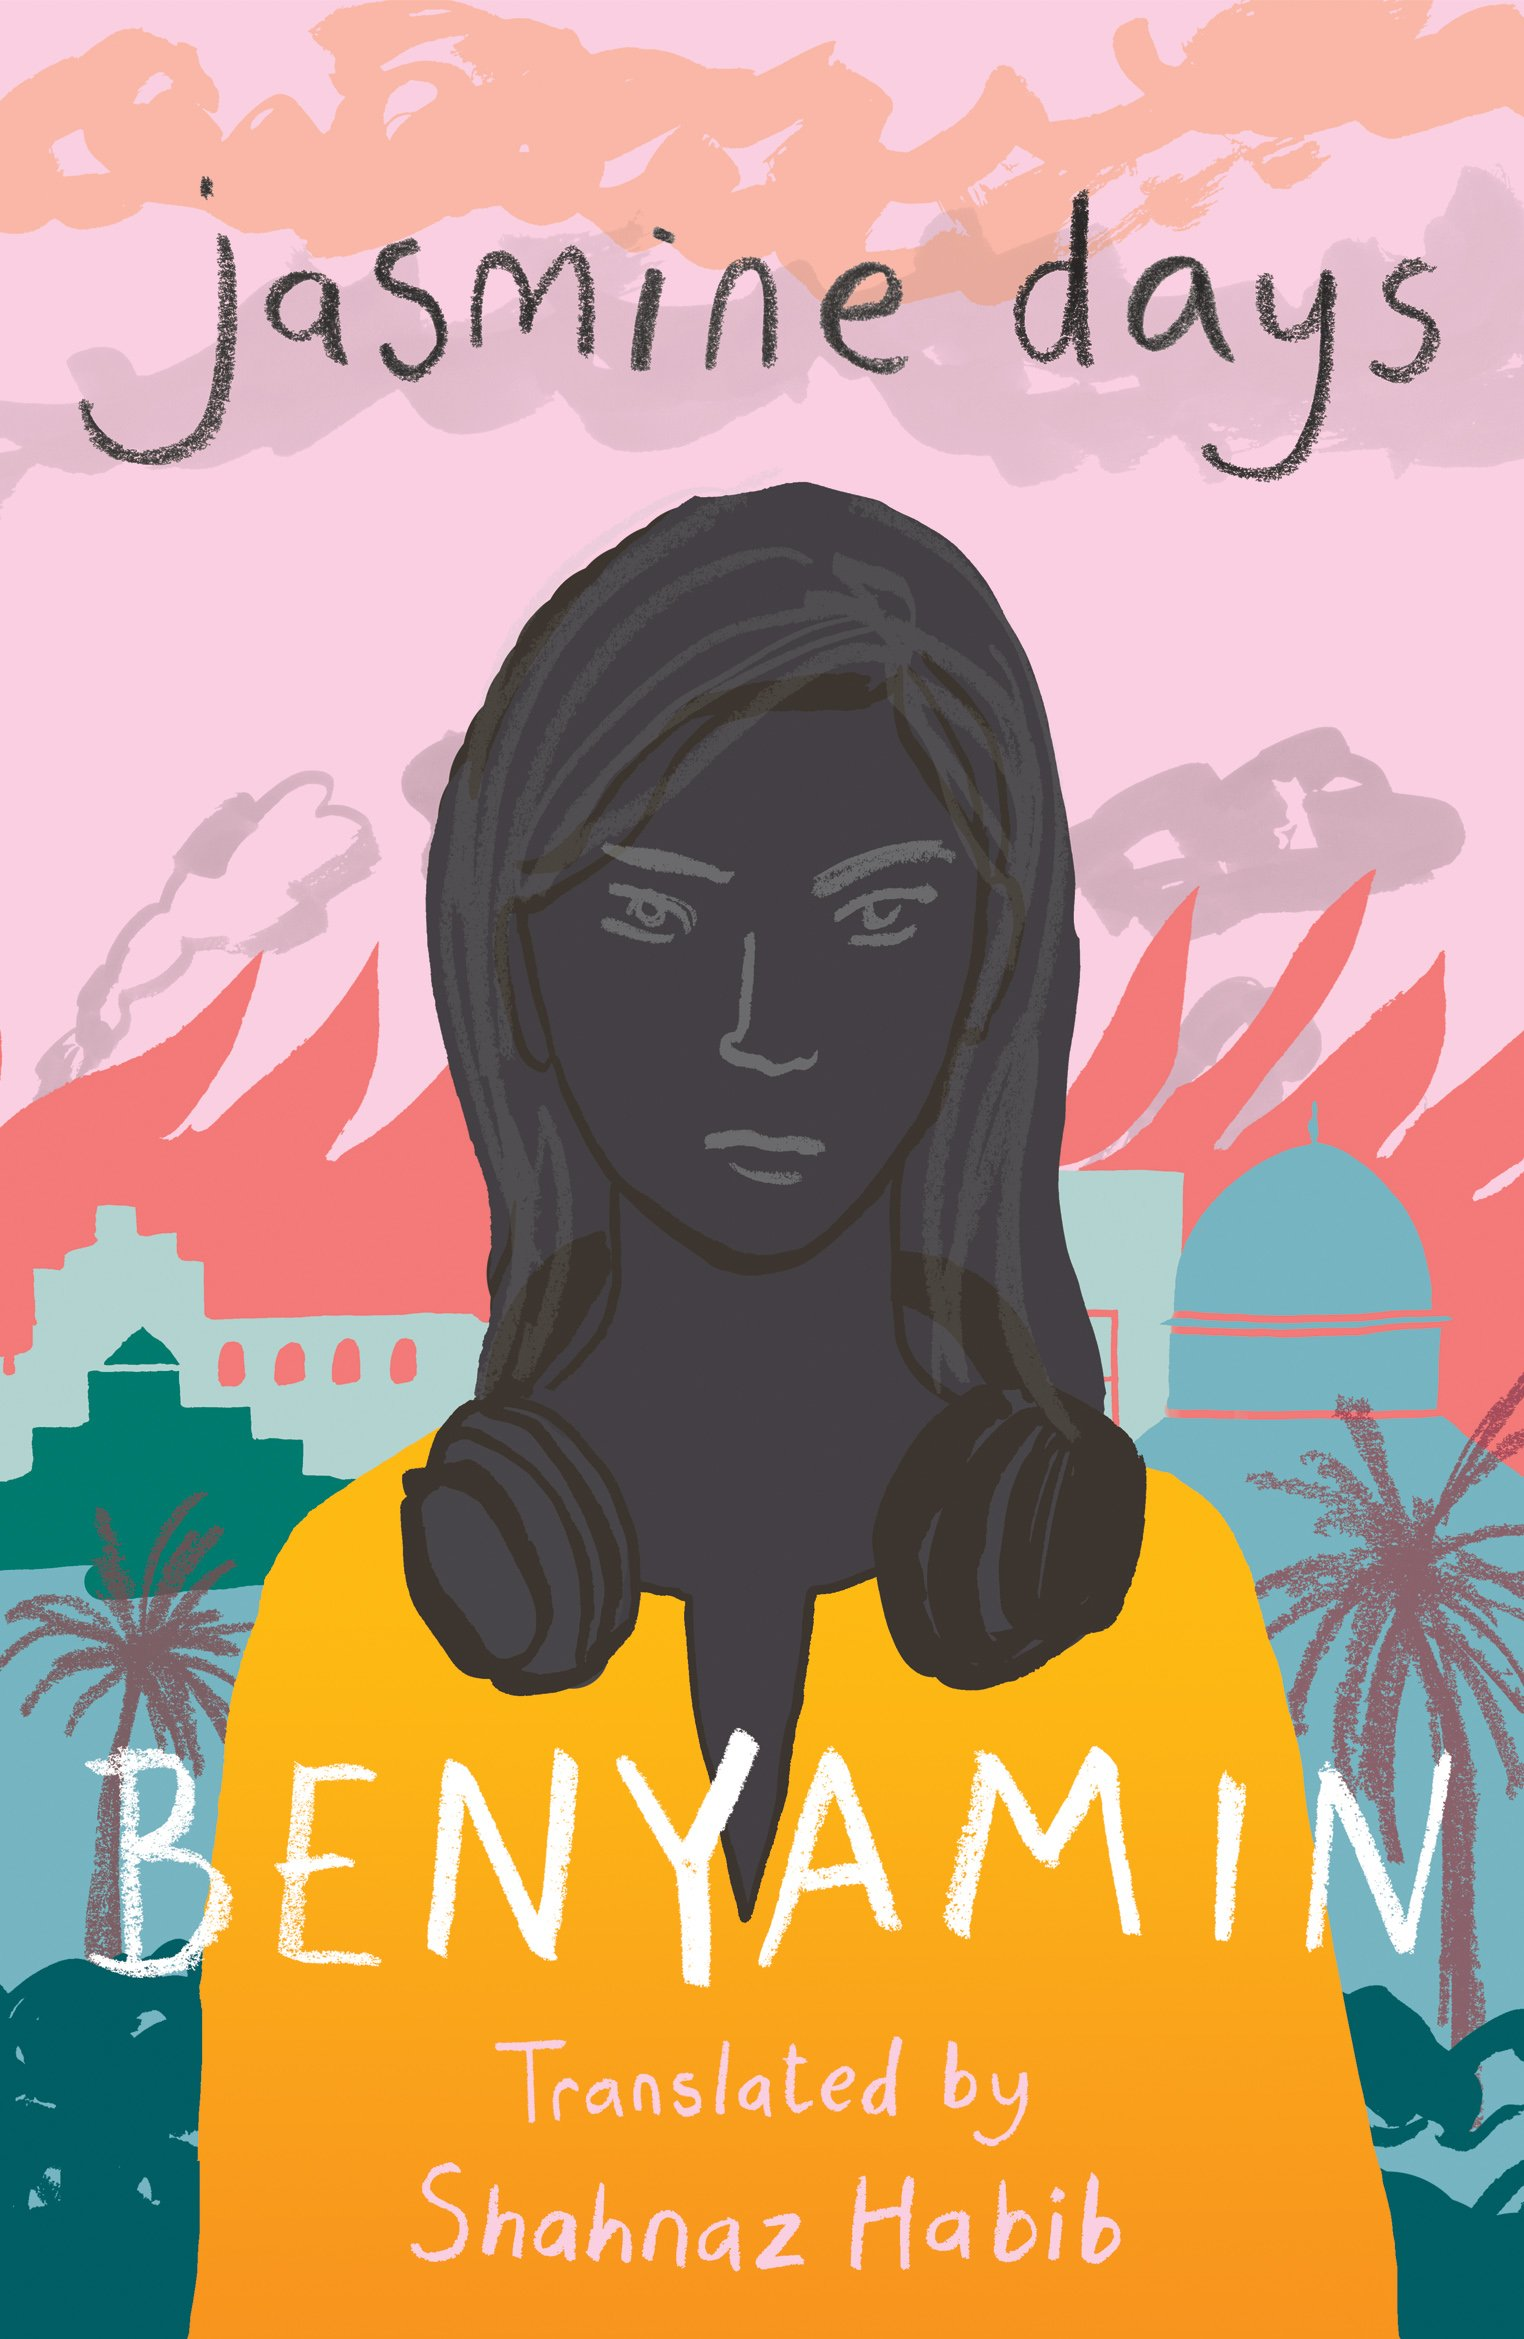 With his new novel 'Jasmine Days', Benyamin once again